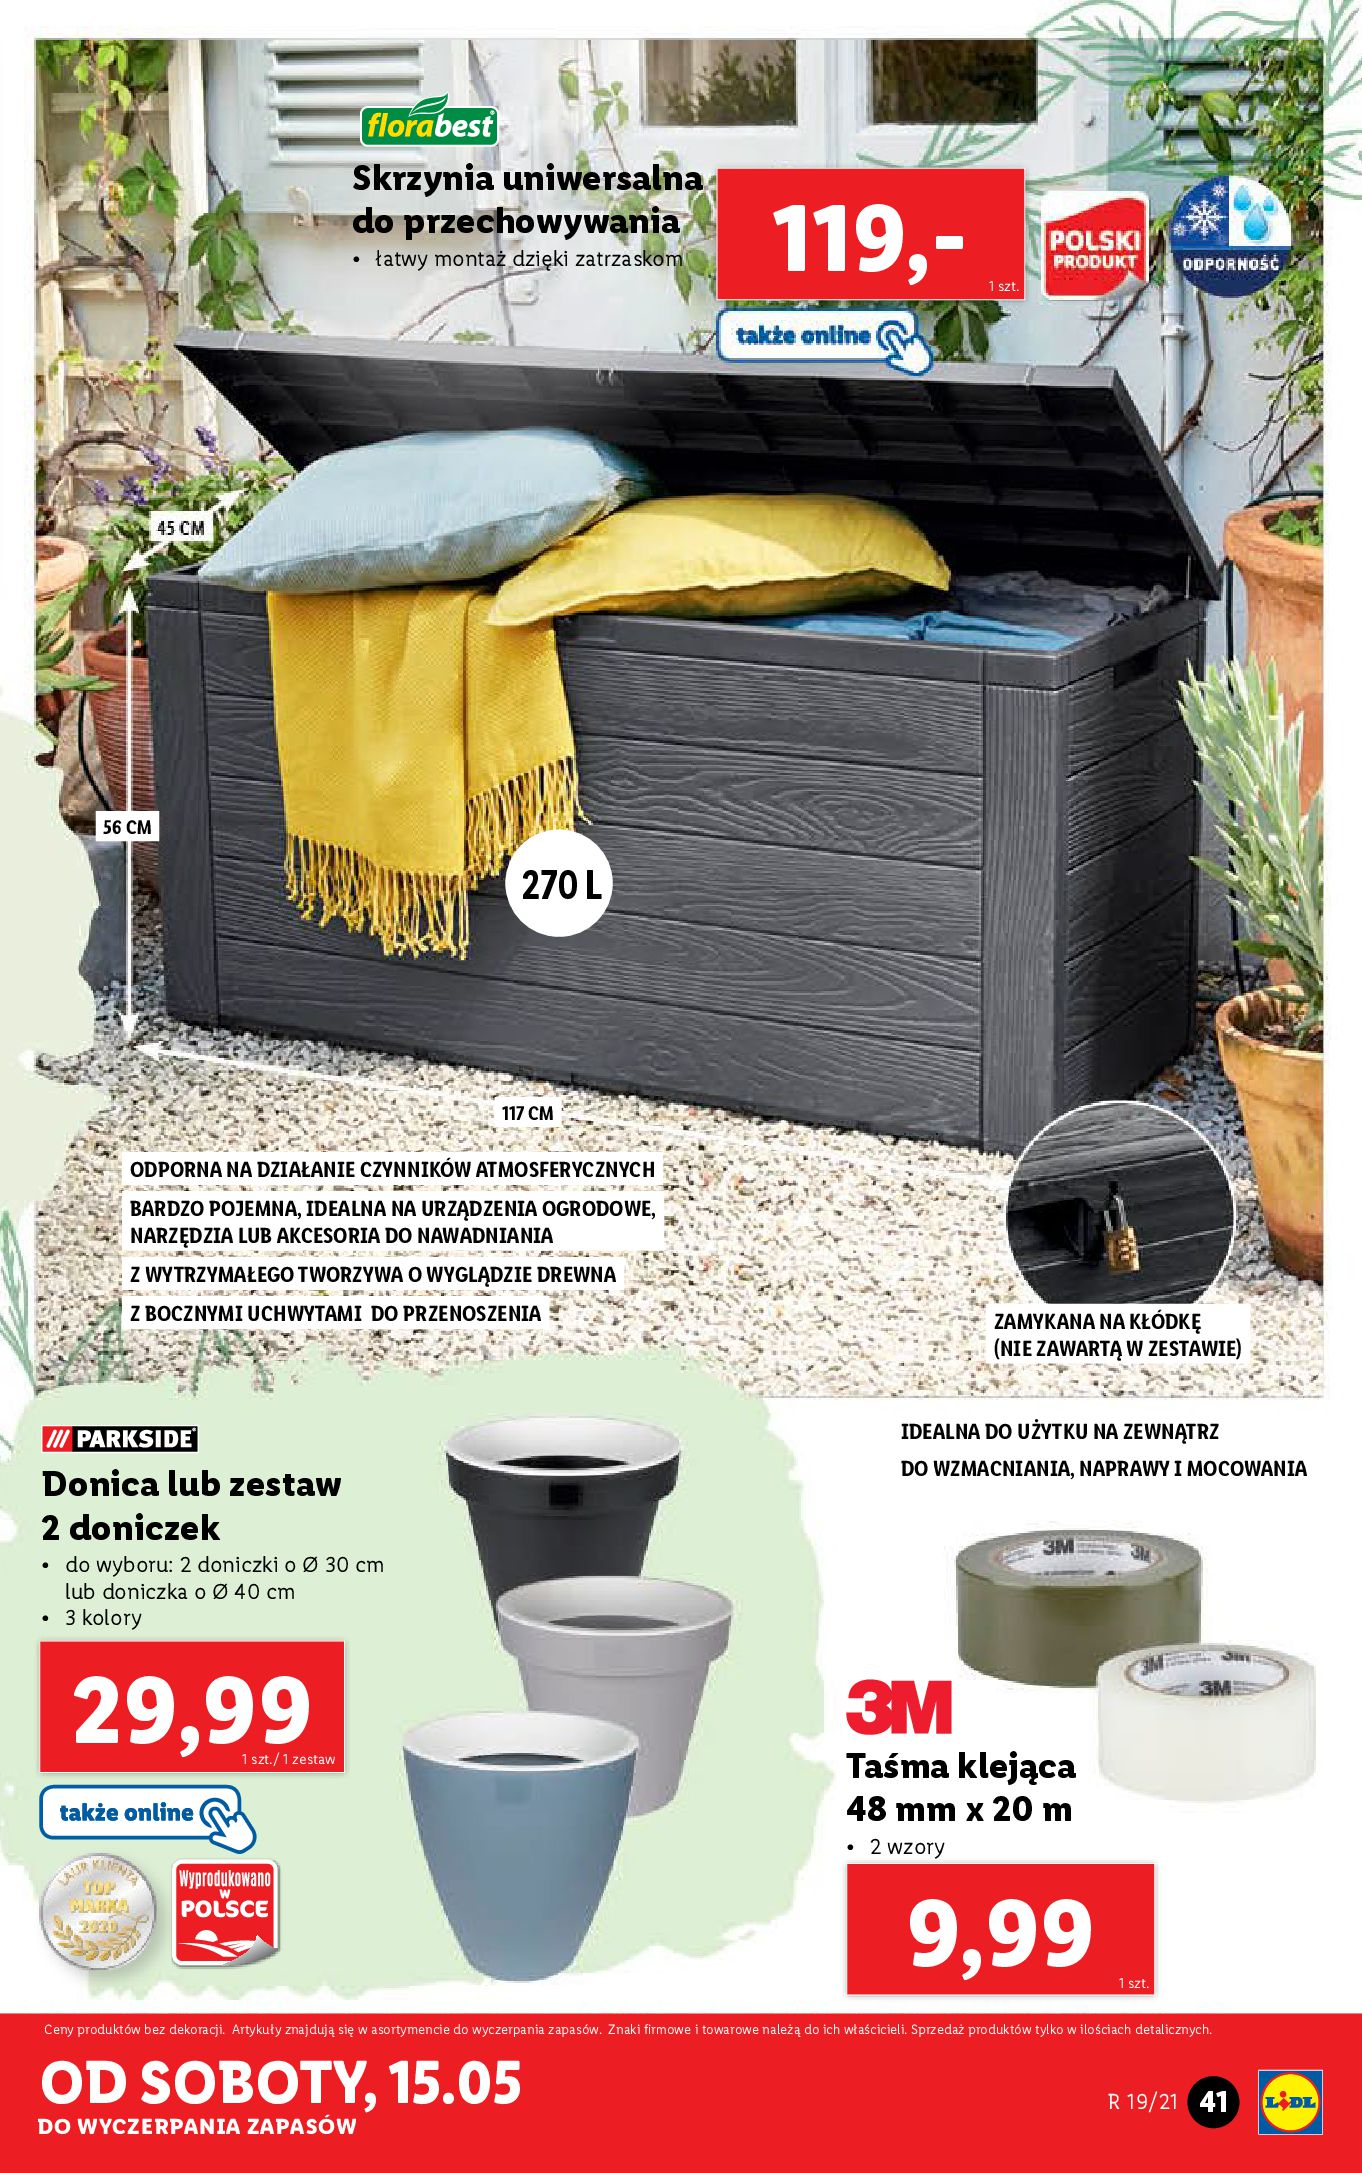 Gazetka Lidl: Katalog od 10.05 2021-05-10 page-41